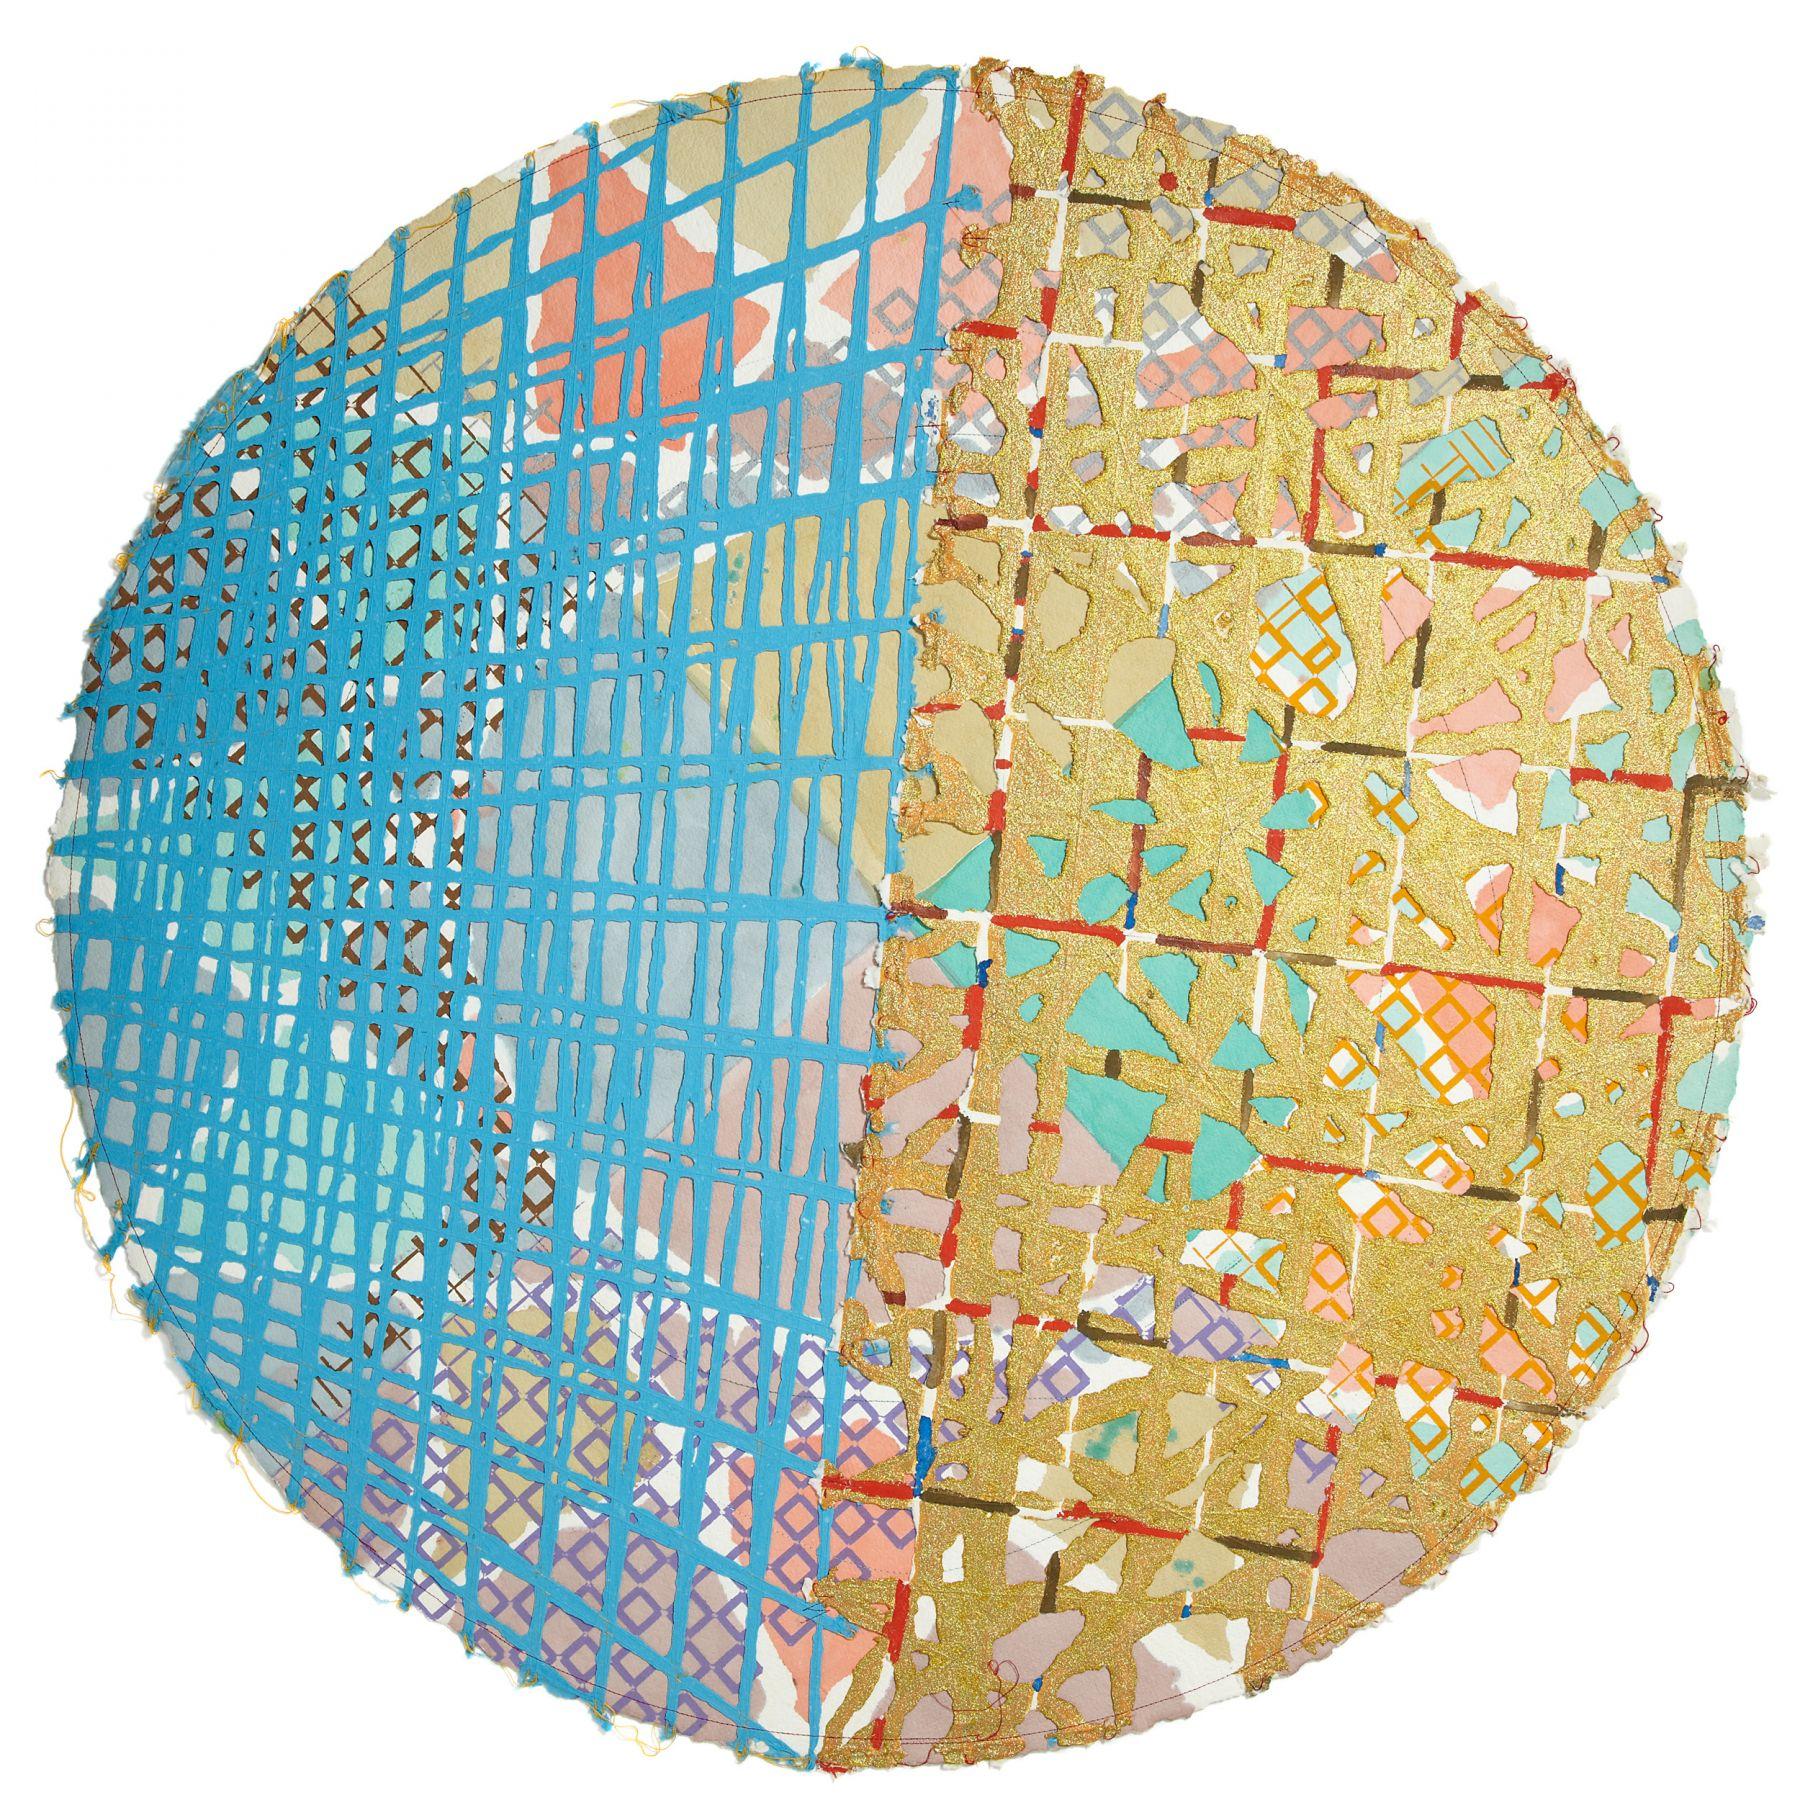 K.E.C., 1985-86, Watercolor, block printing, glitter, stitching on handmade paper, 46 1/4 inches (117.5 cm) diameter